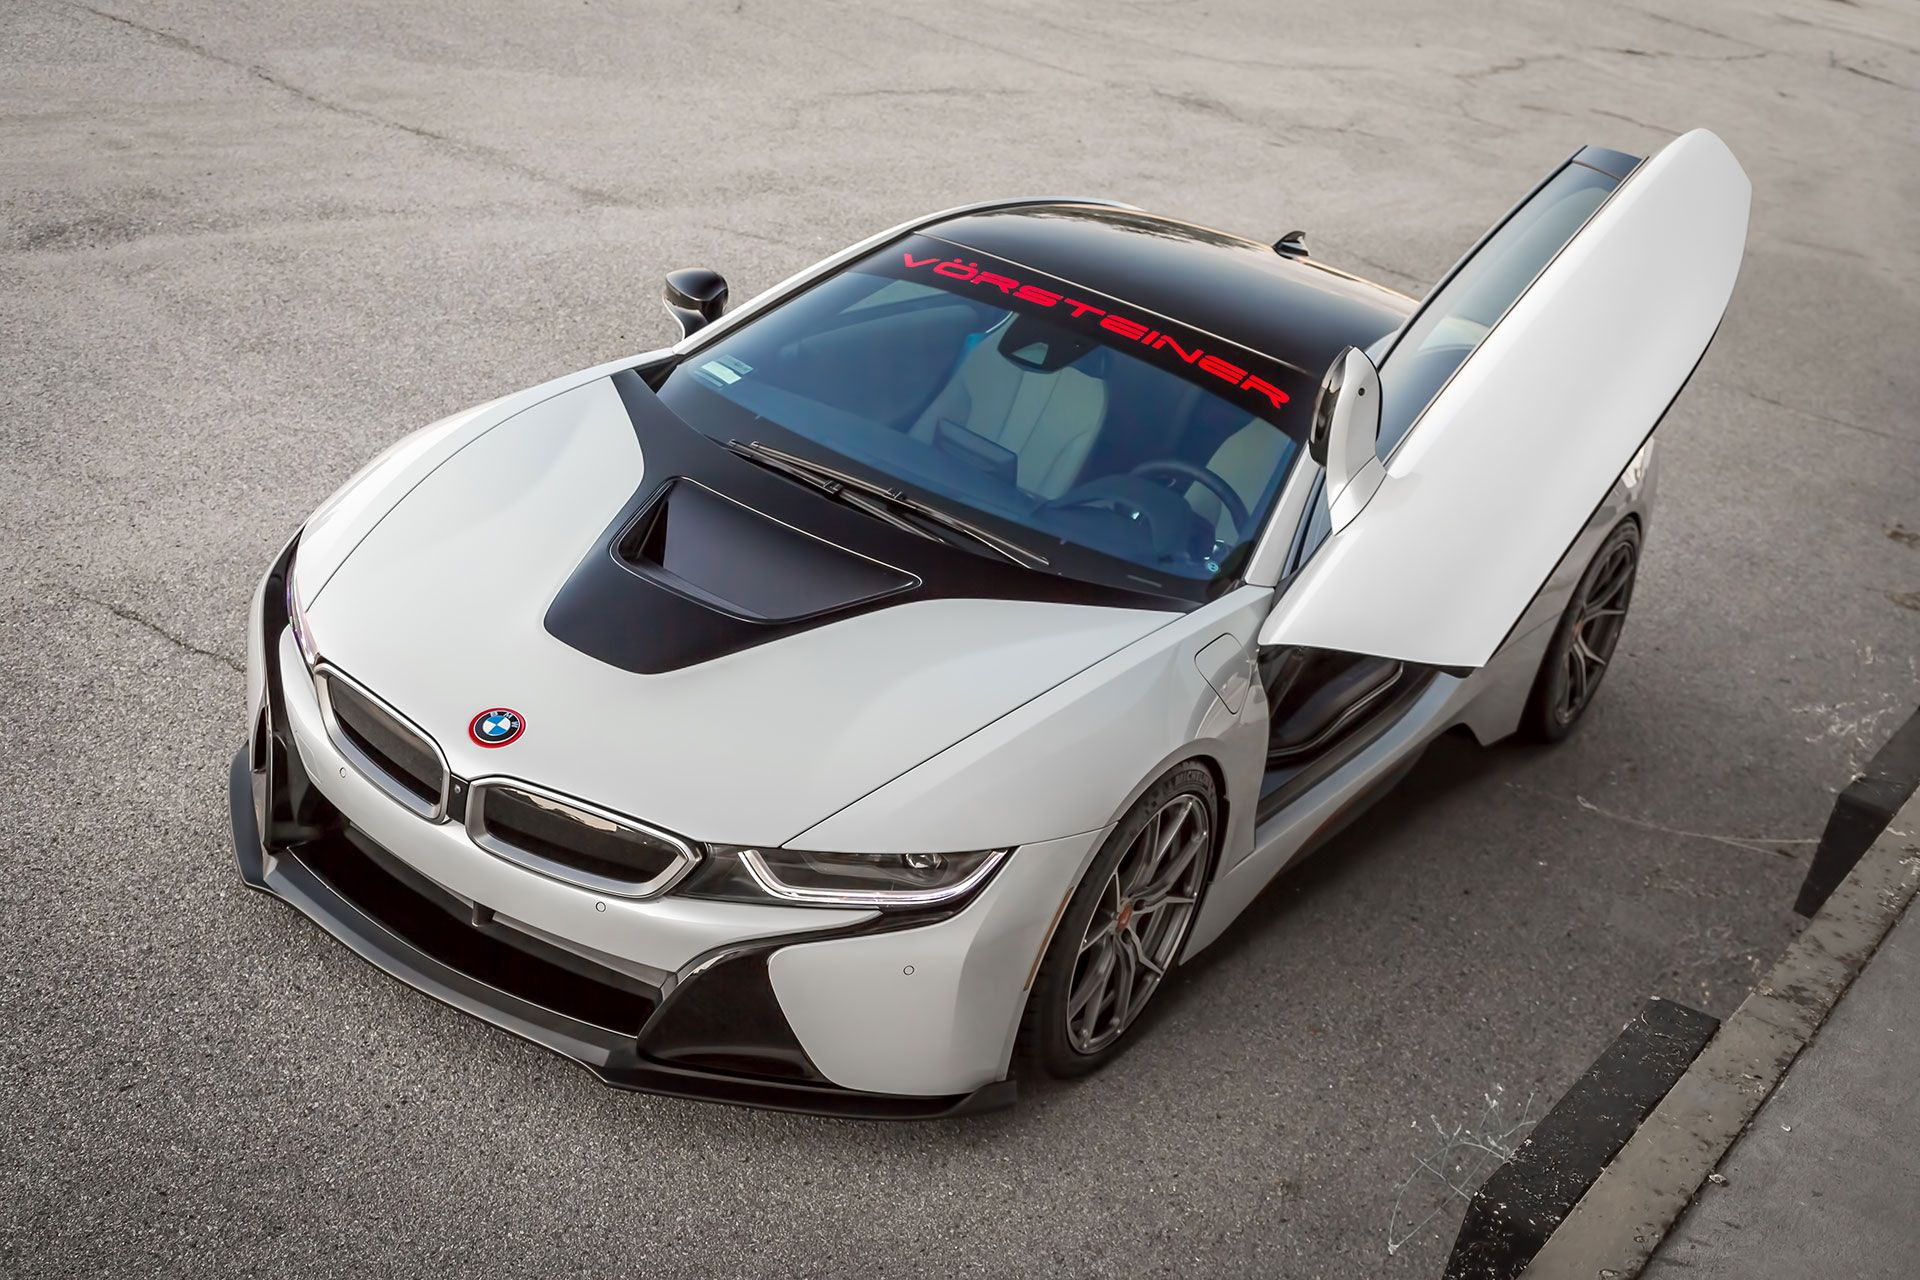 Bmw I8 Body Kits Carbon Fiber Aero Kits Vorsteiner Cars